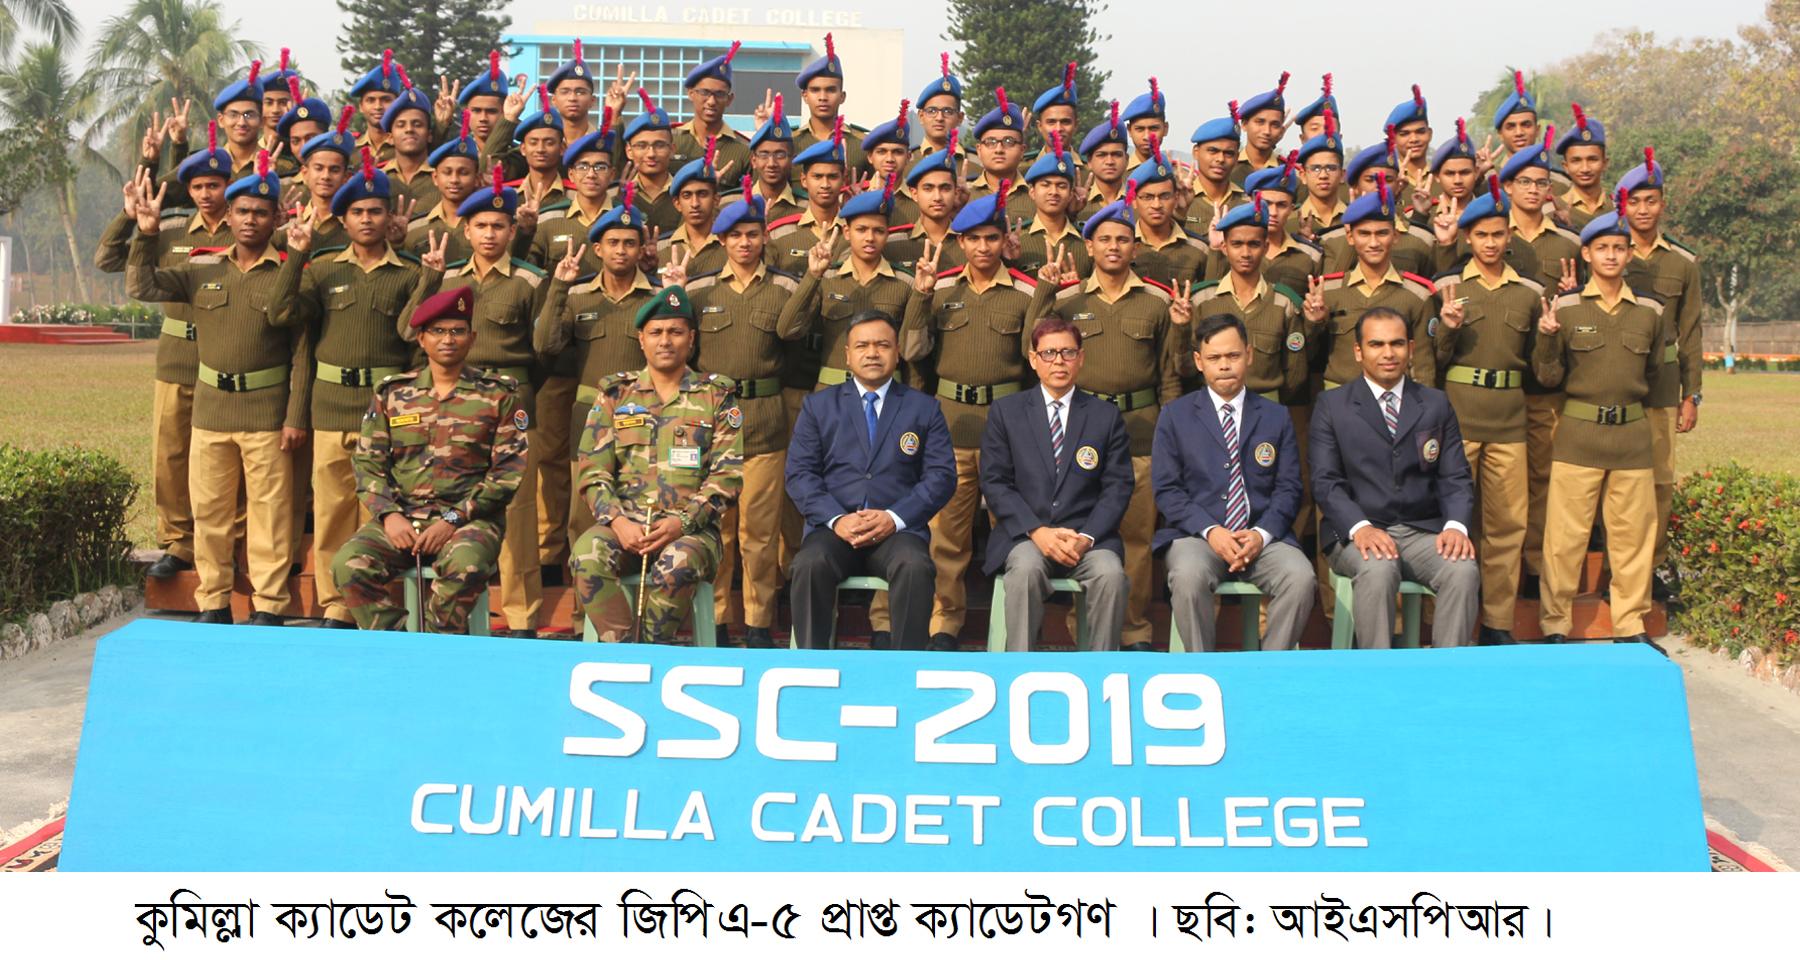 V-sign Photo (SSC Candidates) 2019